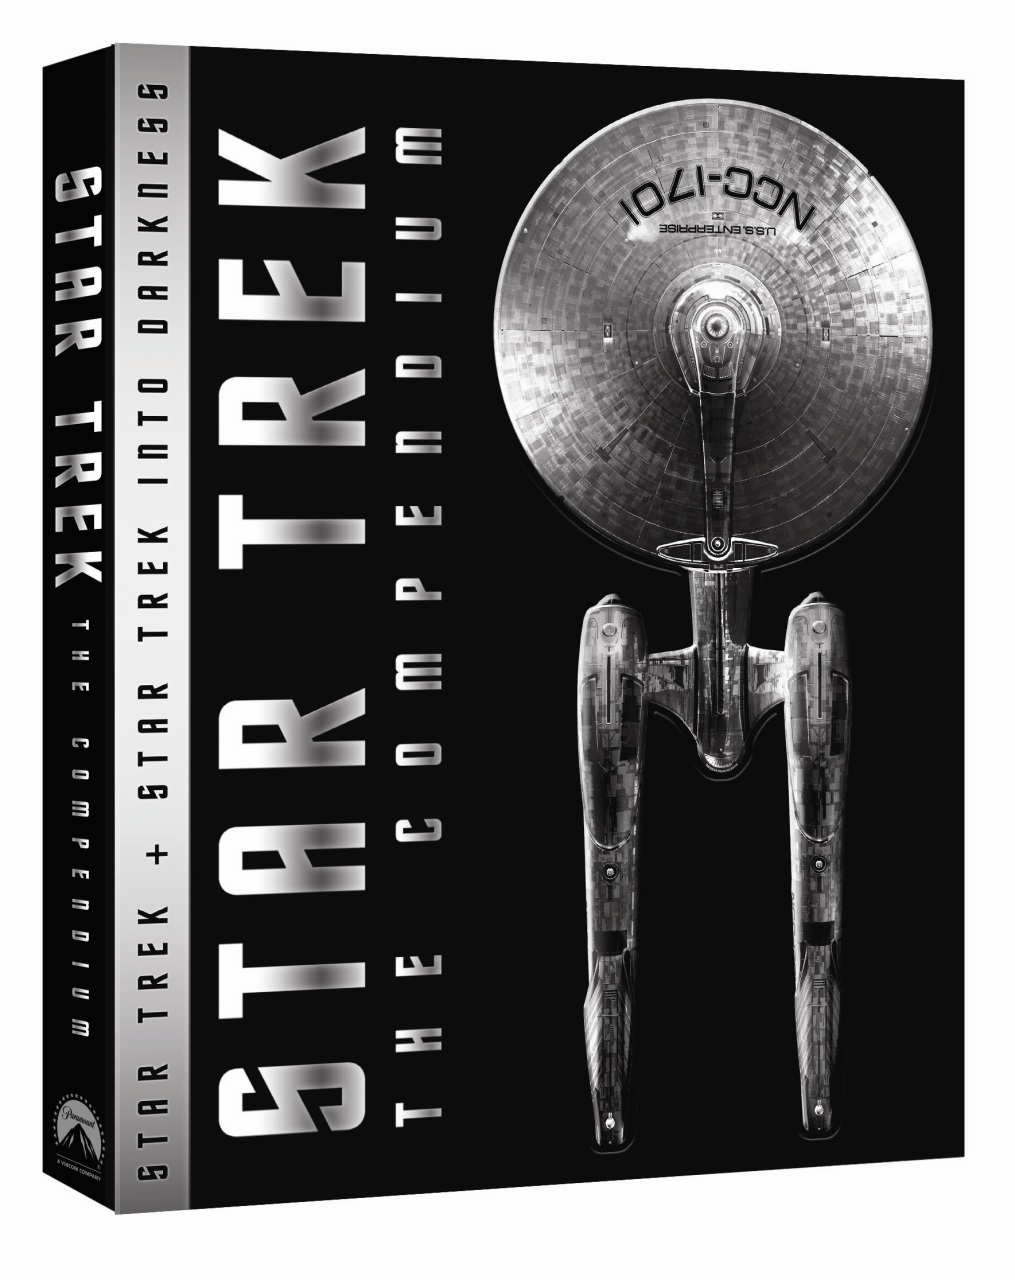 Star Trek The Conpendium Blu-ray Review